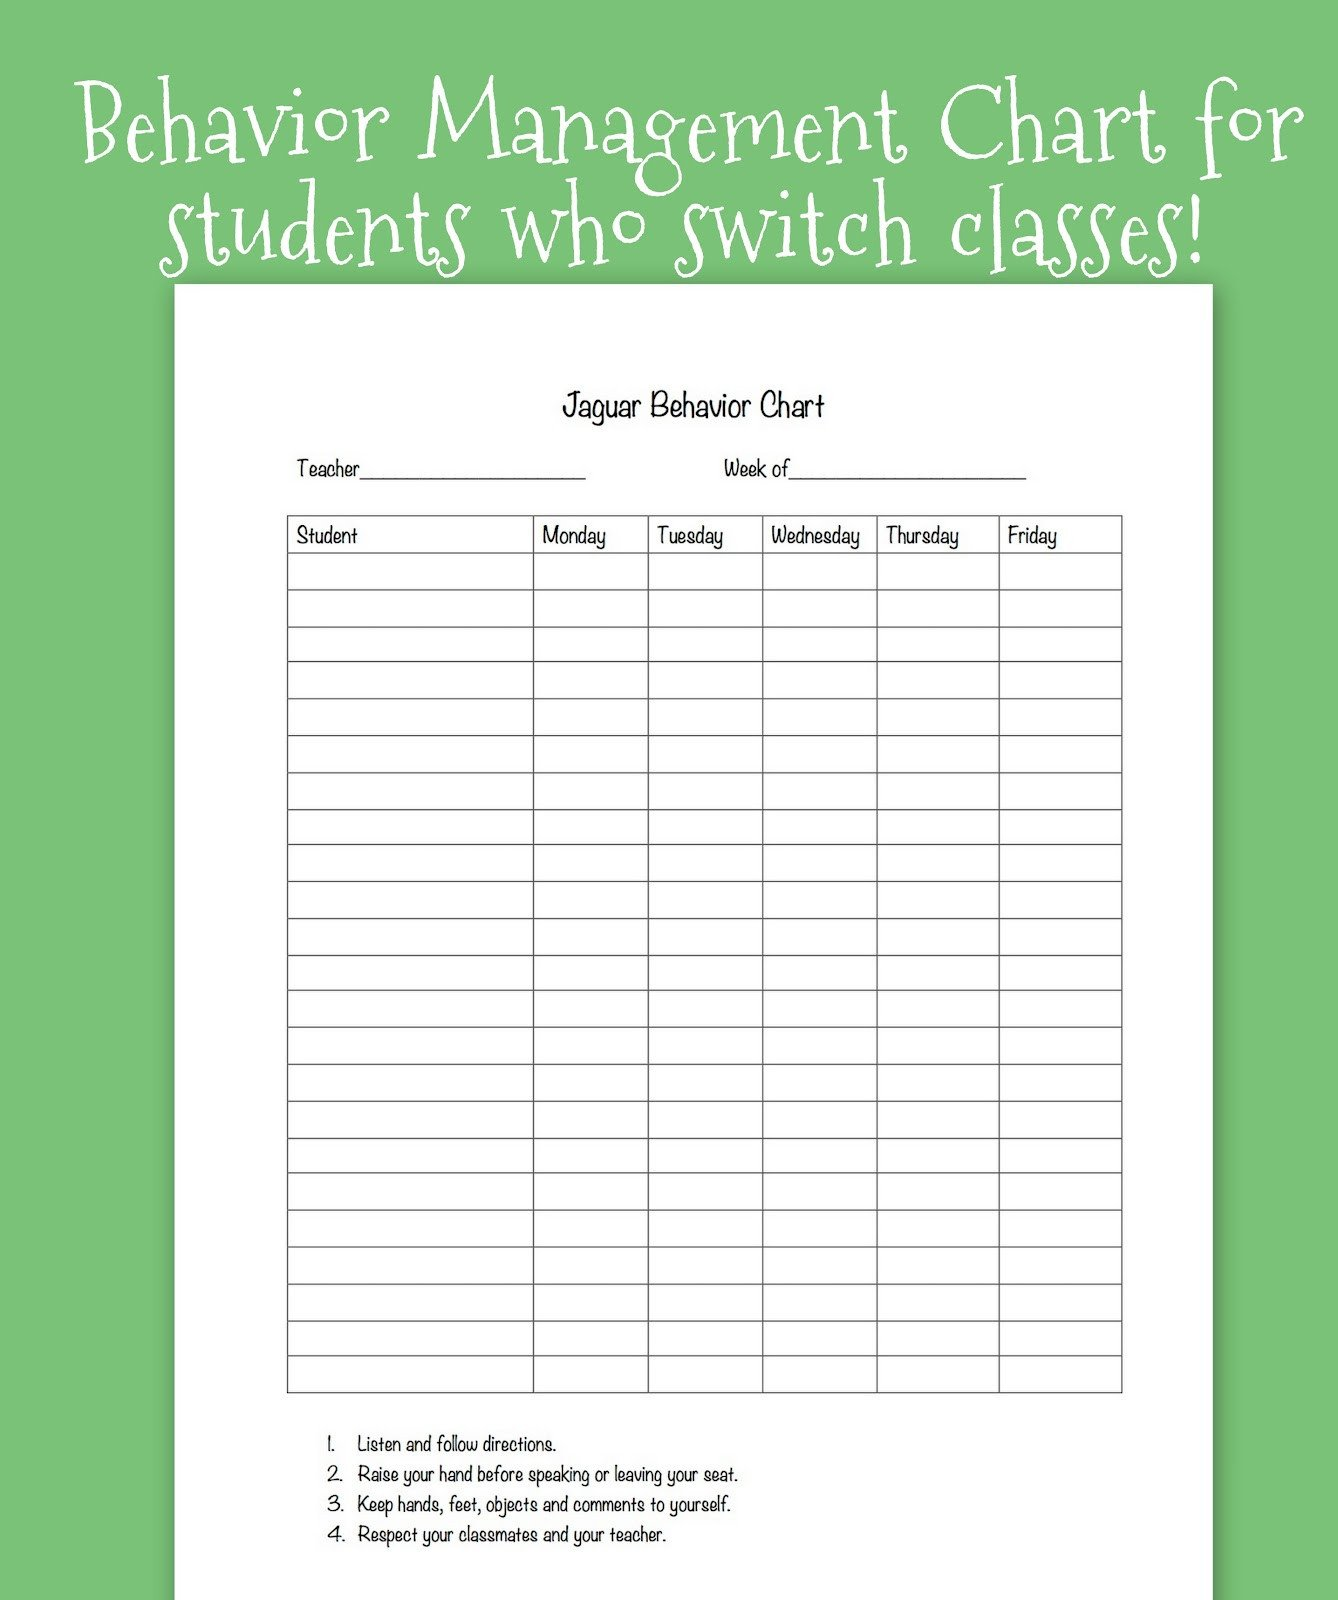 Behavior Charts for Teachers Tween Teaching Classroom Behavior System for Upper Grades